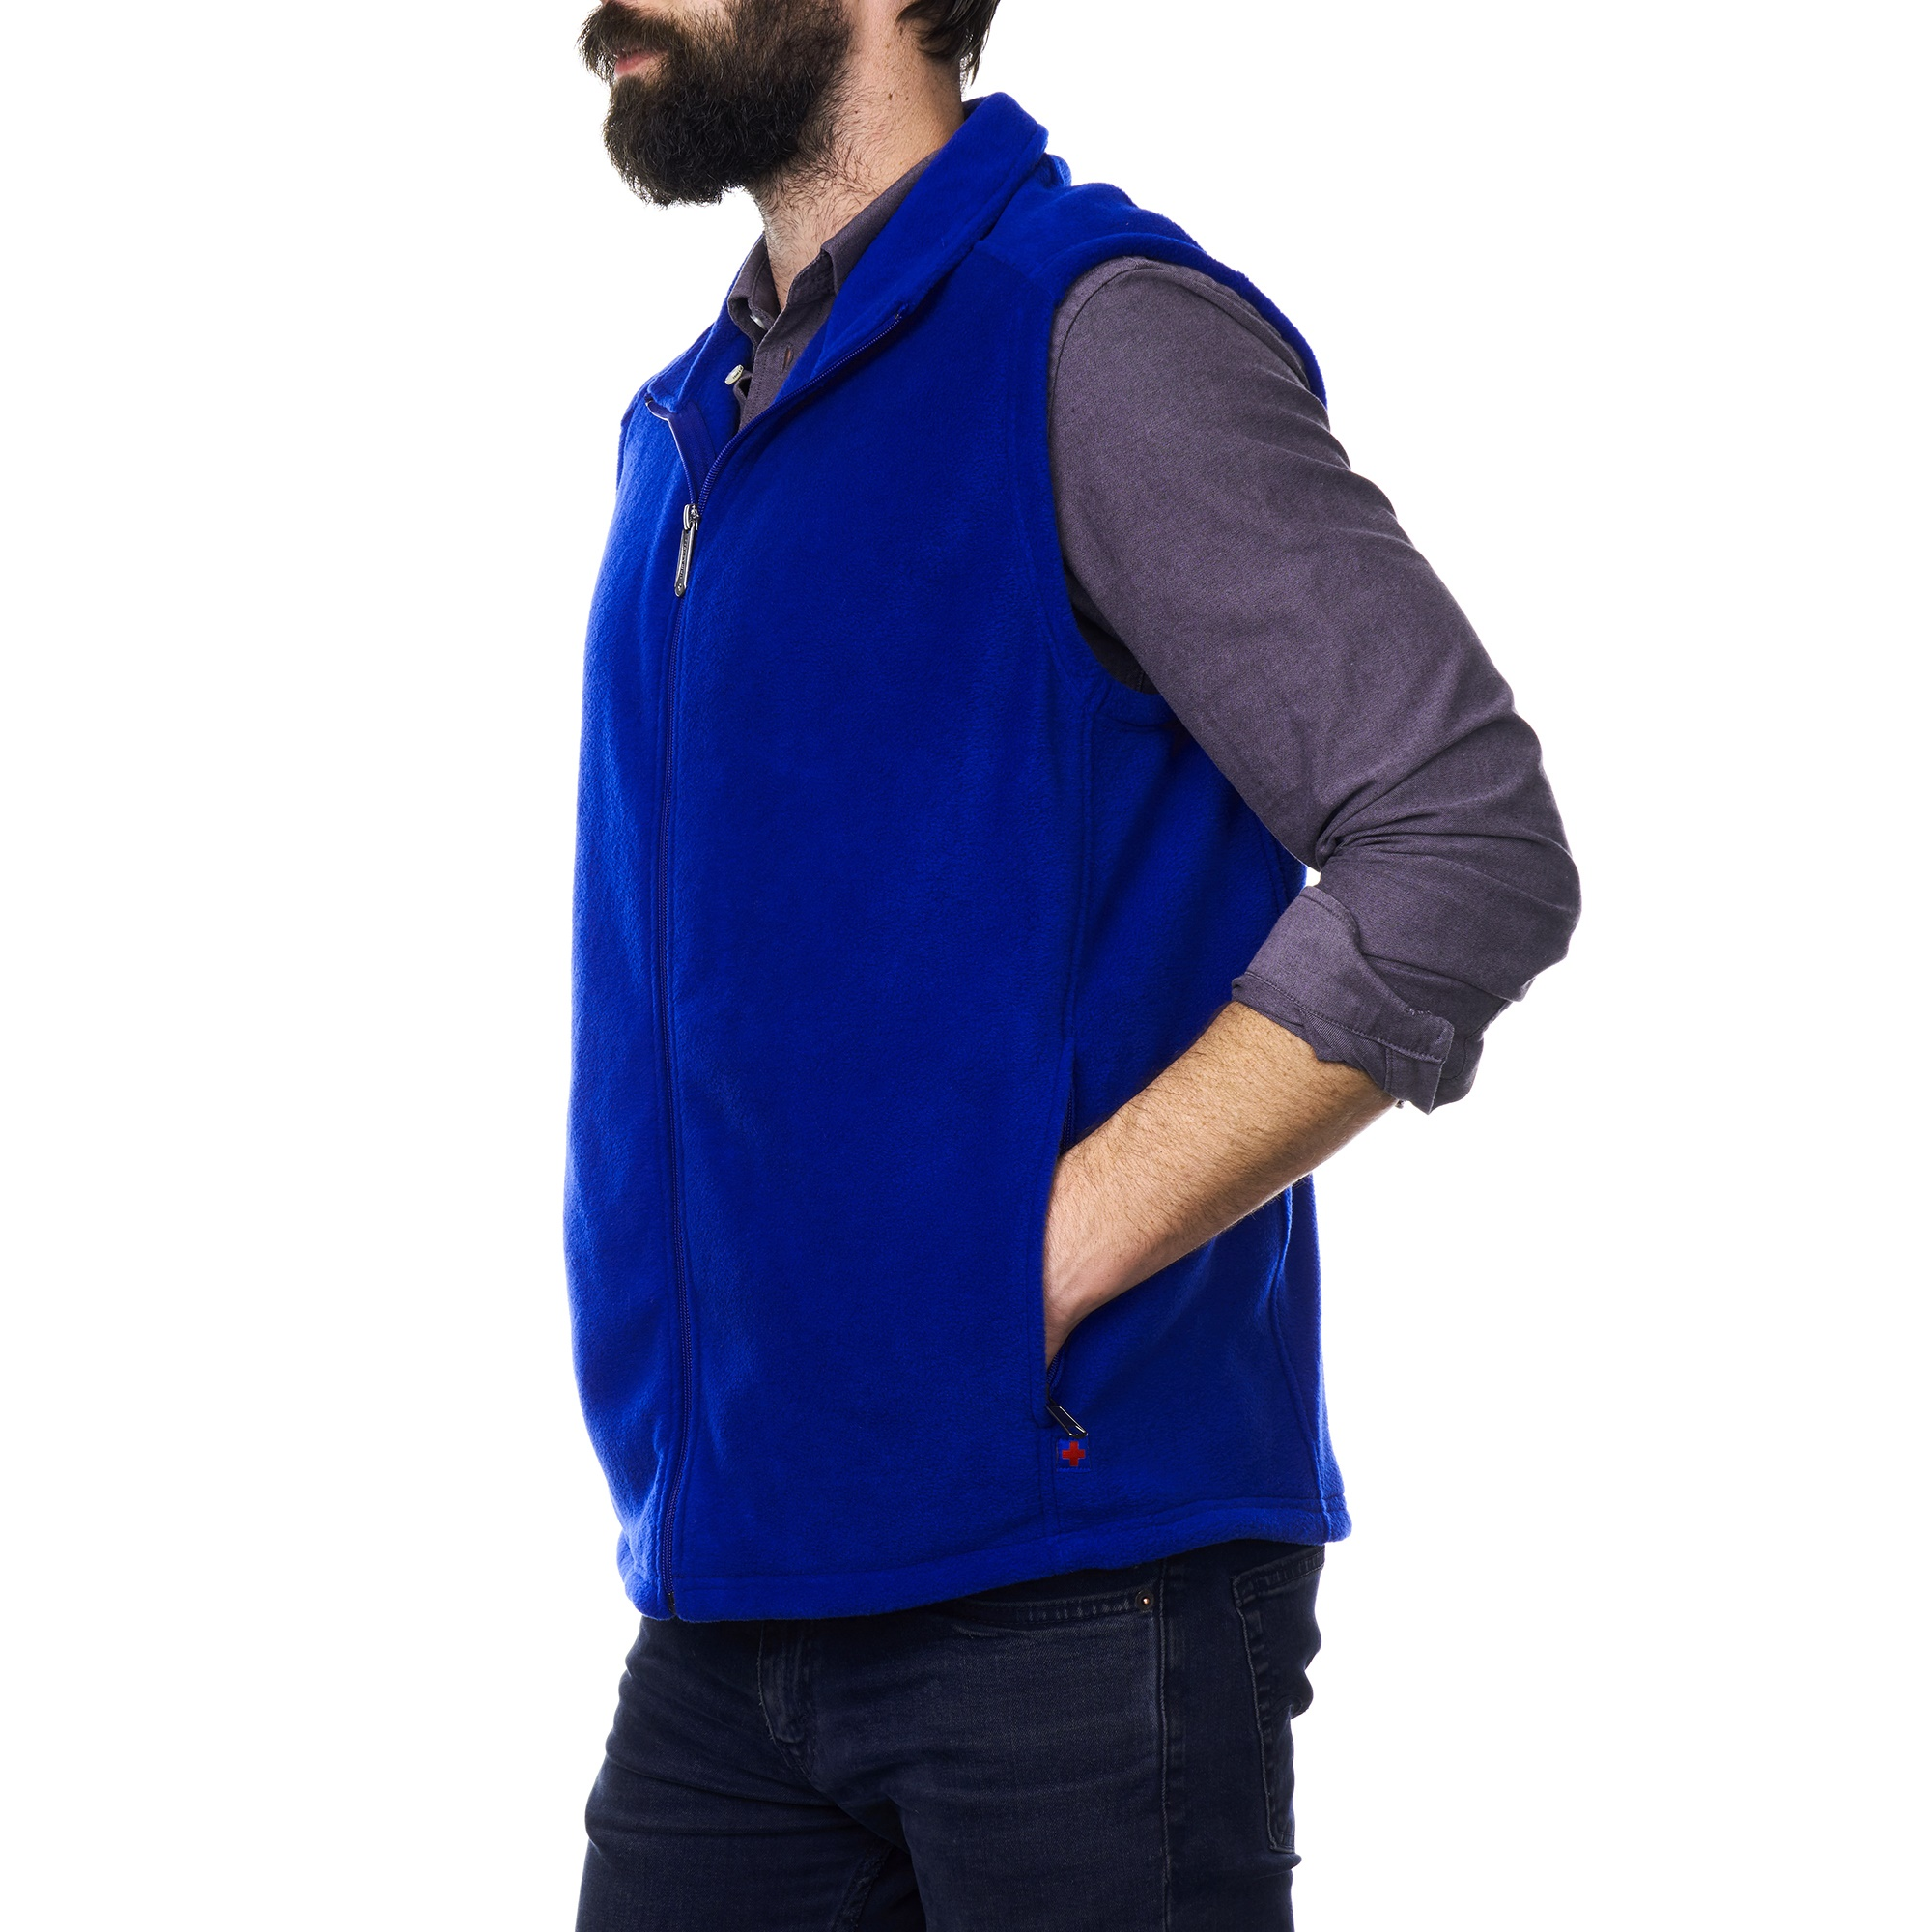 Alpine-Swiss-Mens-Full-Zip-Up-Fleece-Vest-Lightweight-Warm-Sleeveless-Jacket thumbnail 21